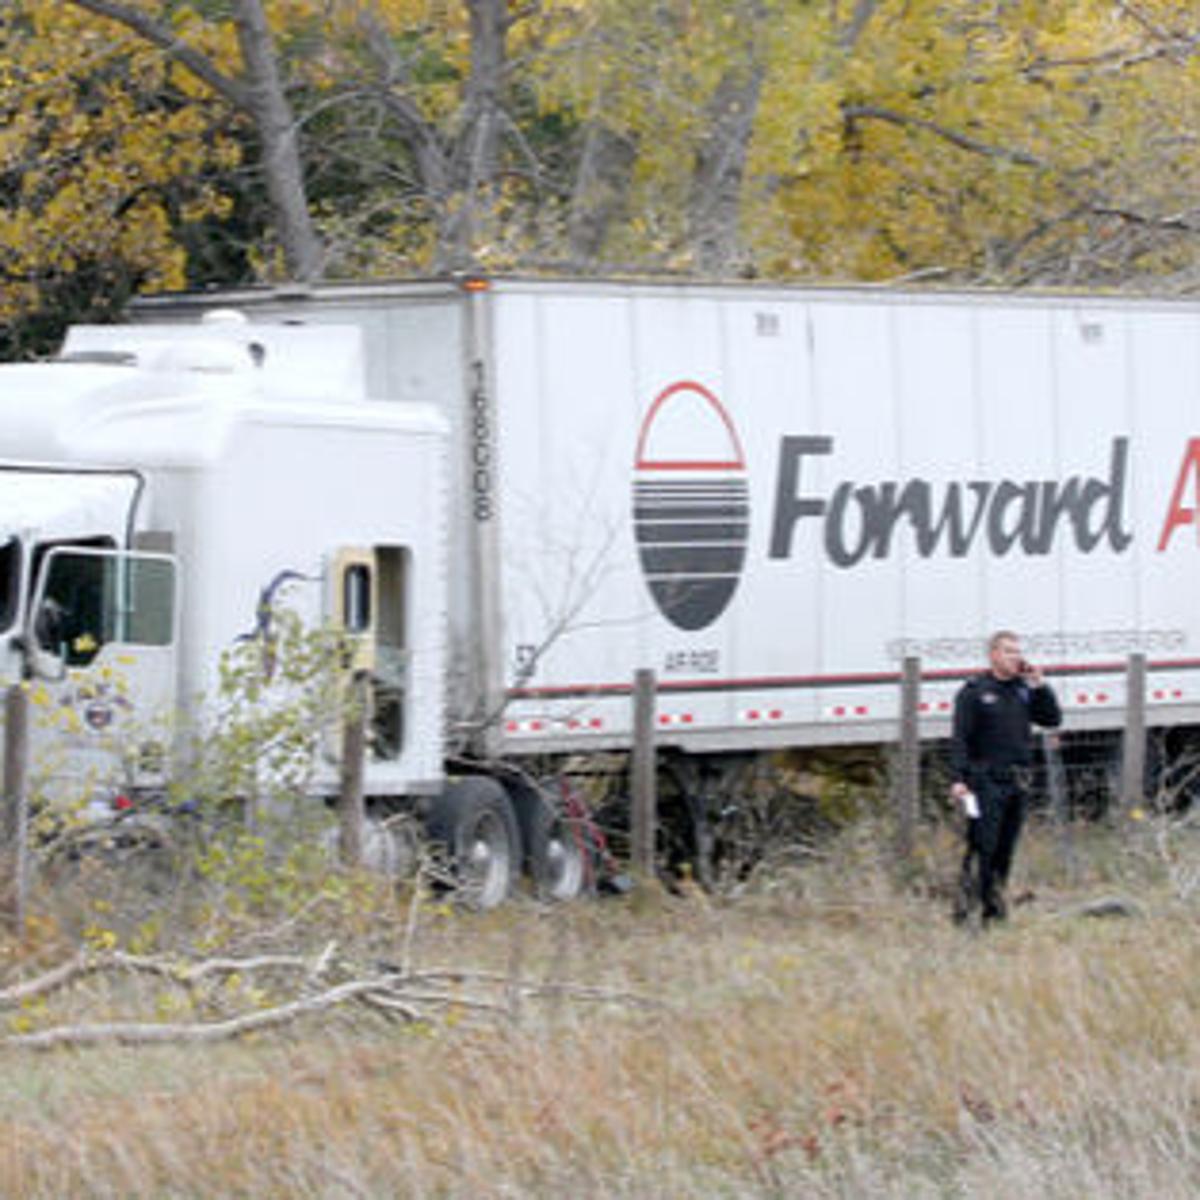 FedEx packages unharmed in semi crash | News | nptelegraph com